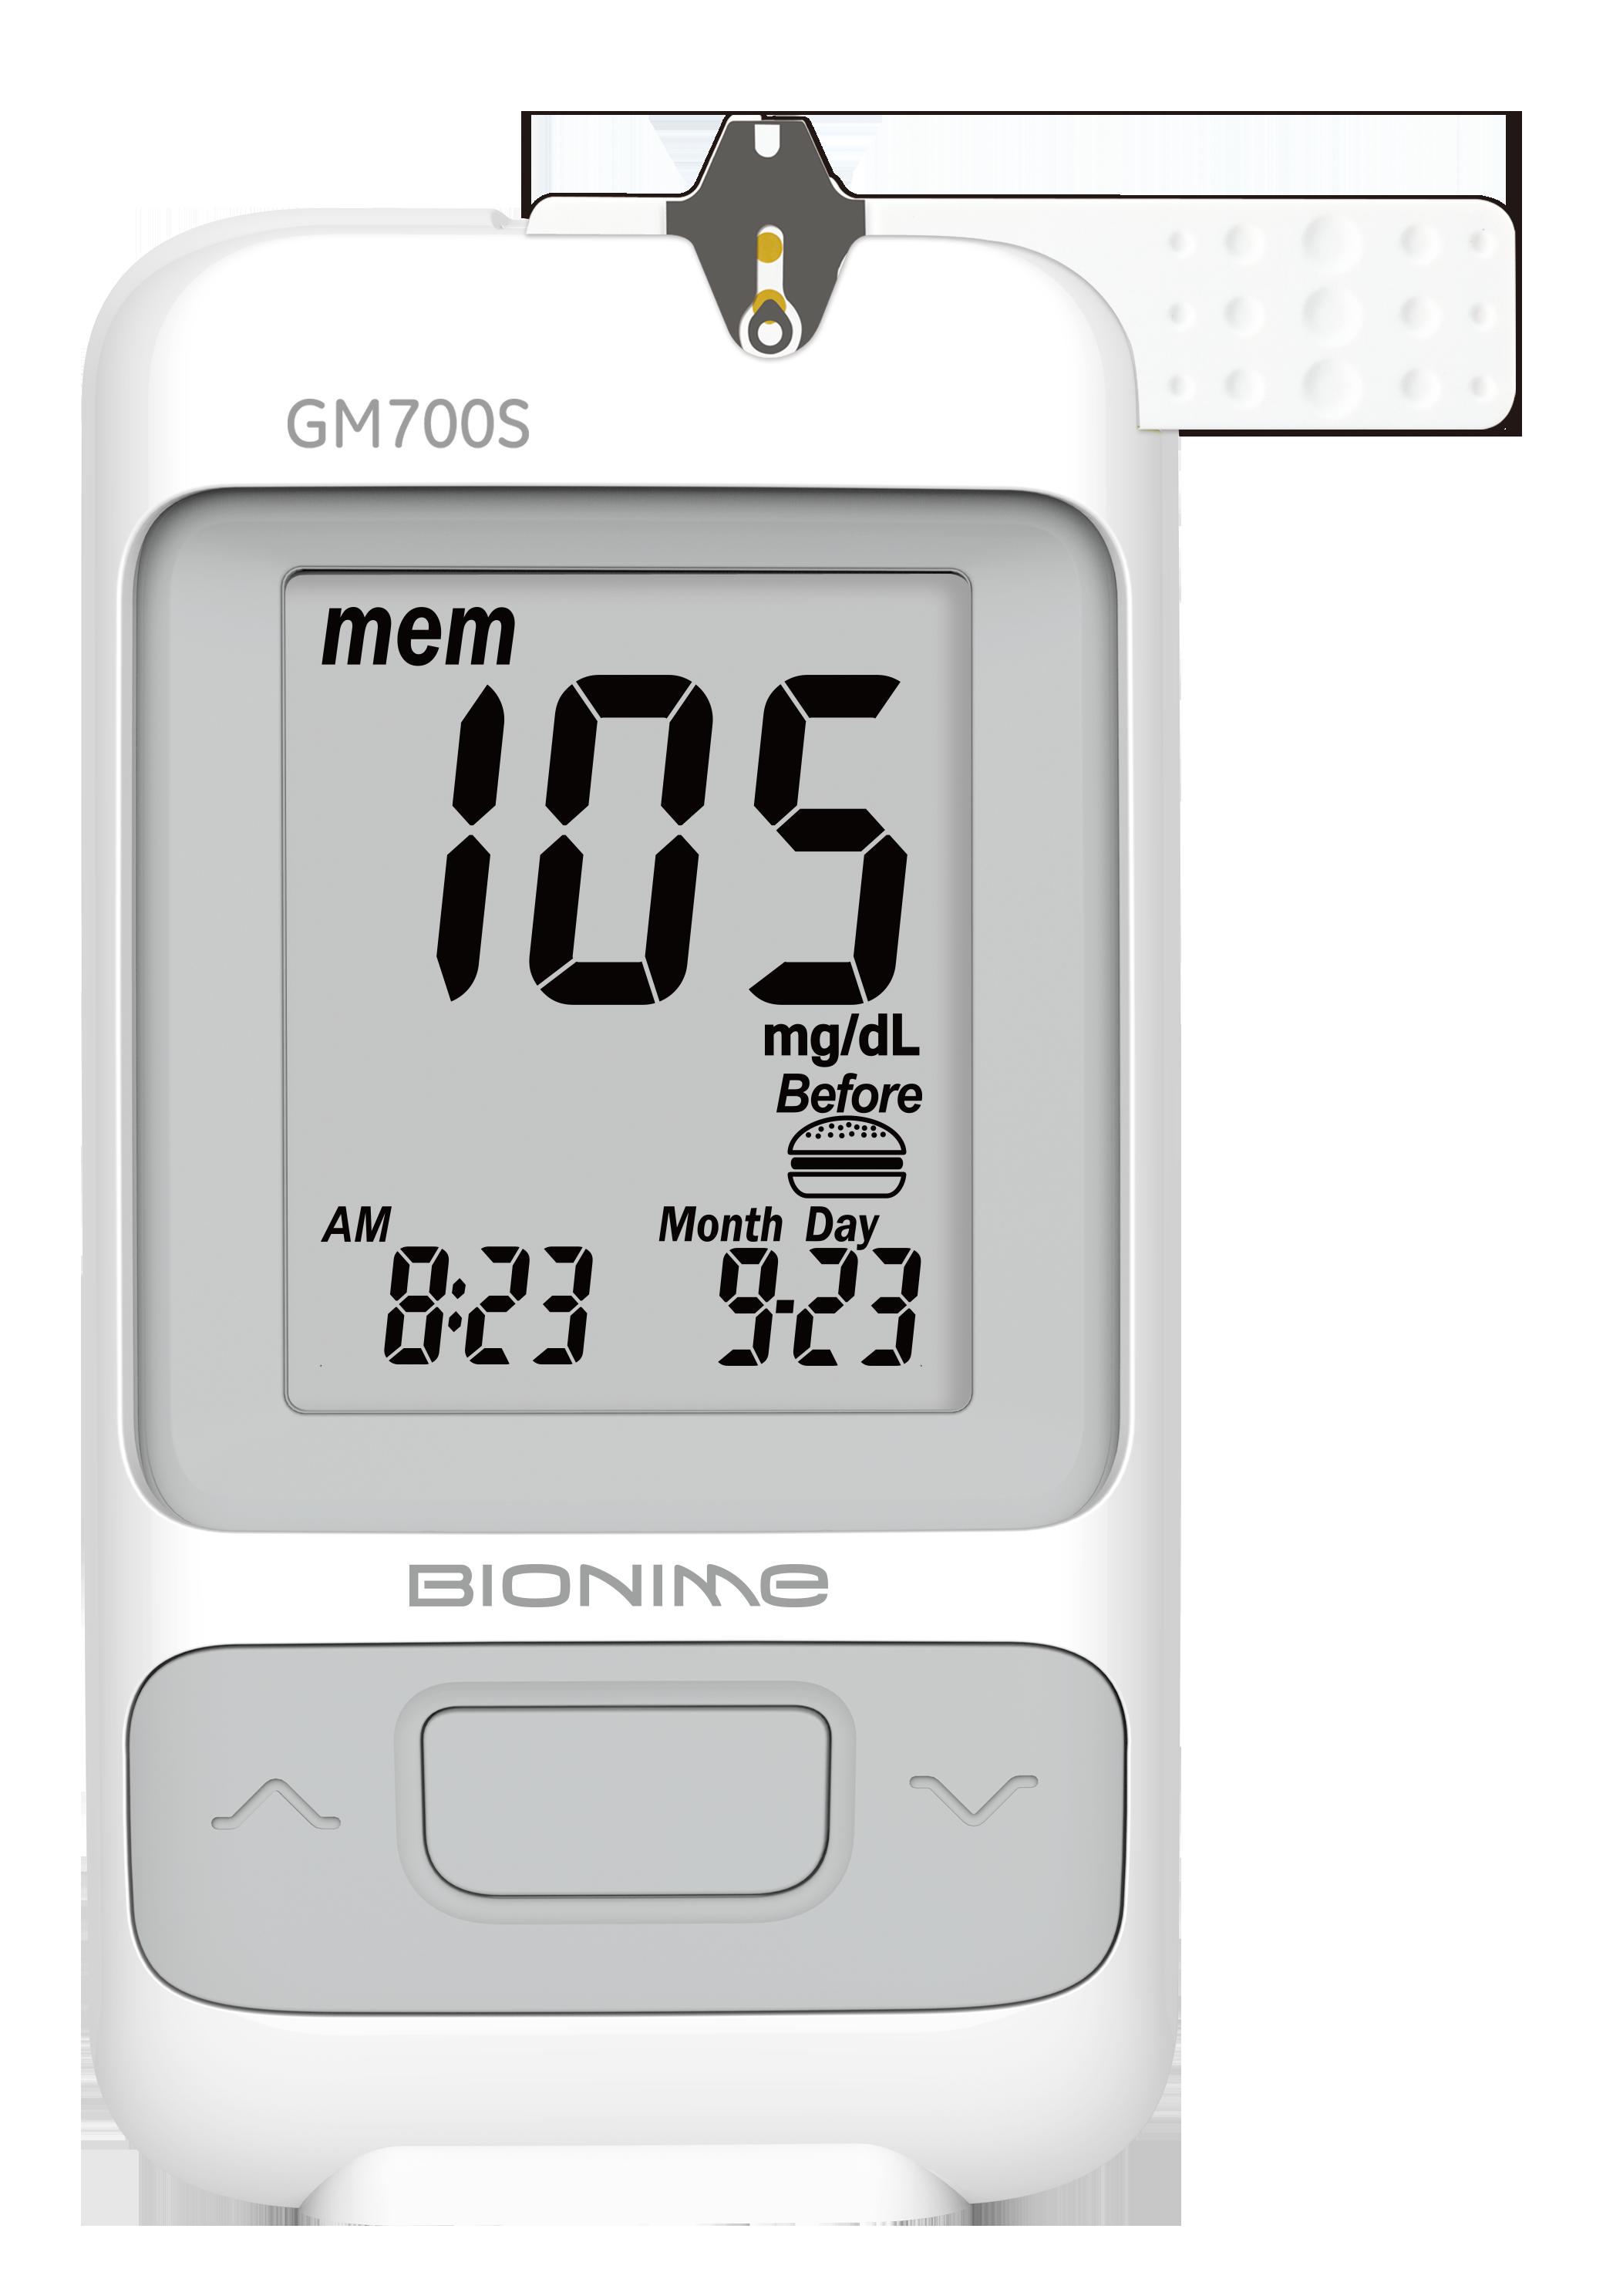 GM700S Blood Glucose Meter